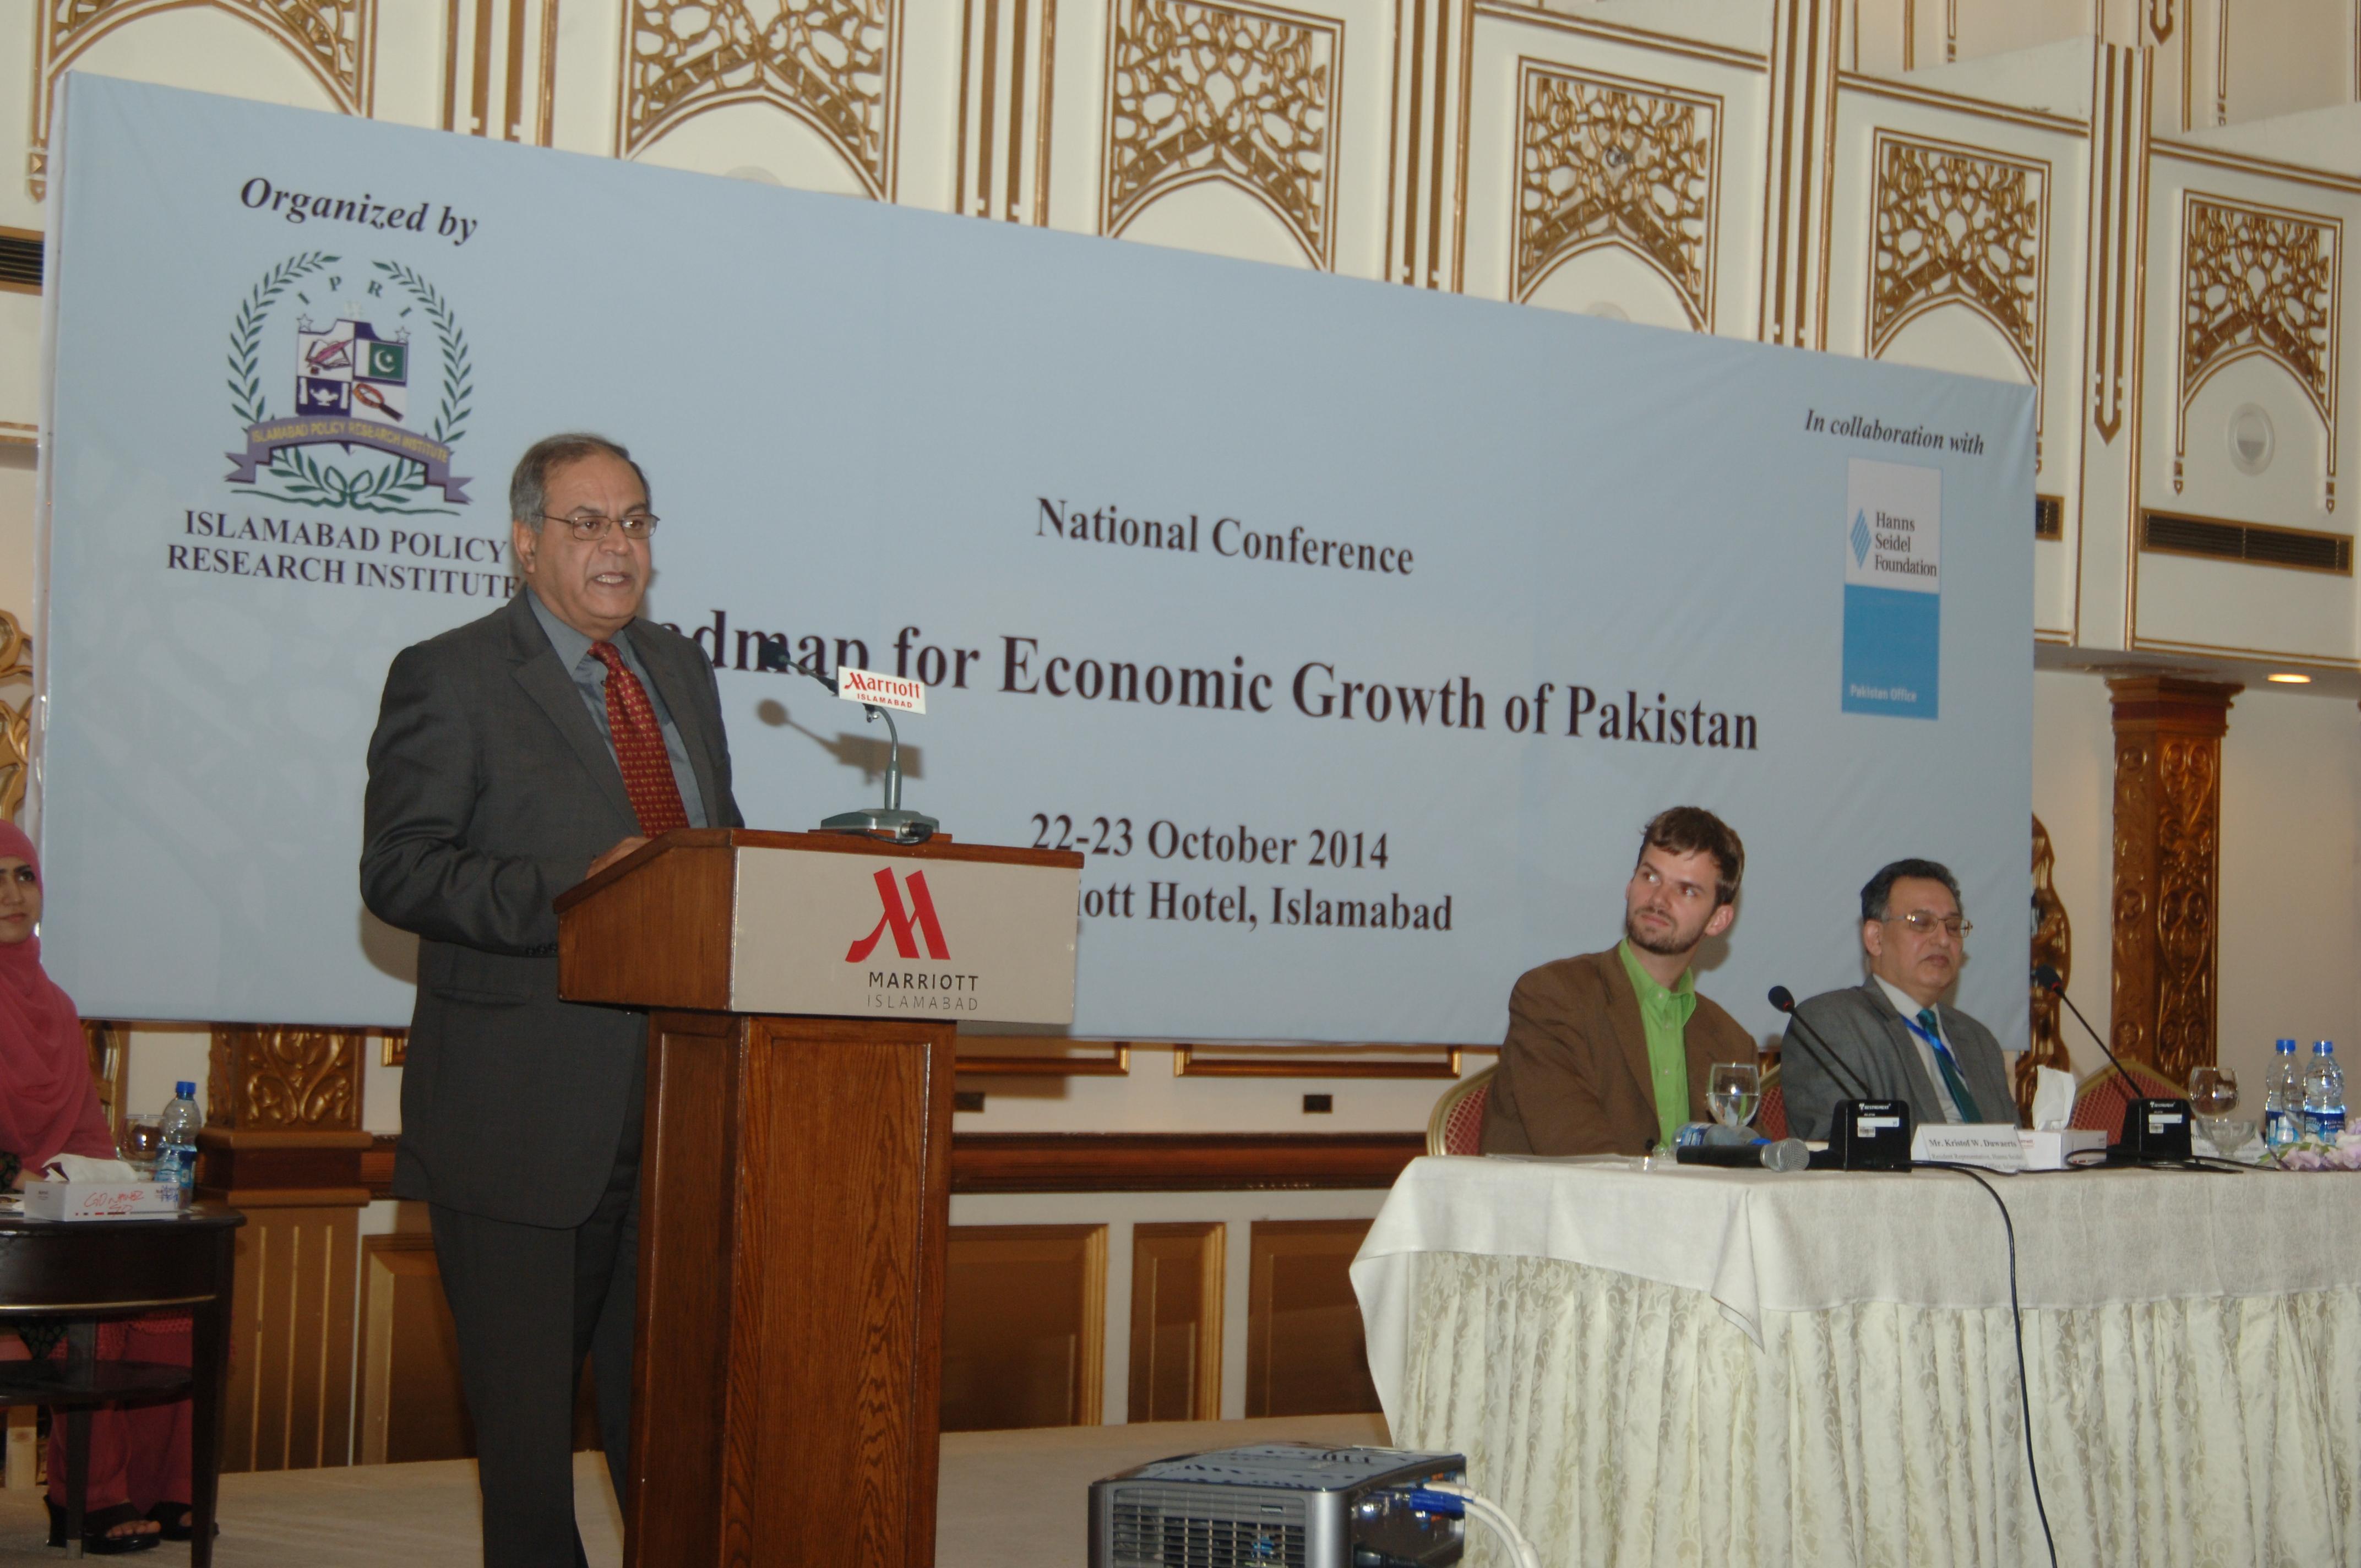 Roadmap for Economic Growth of Pakistan